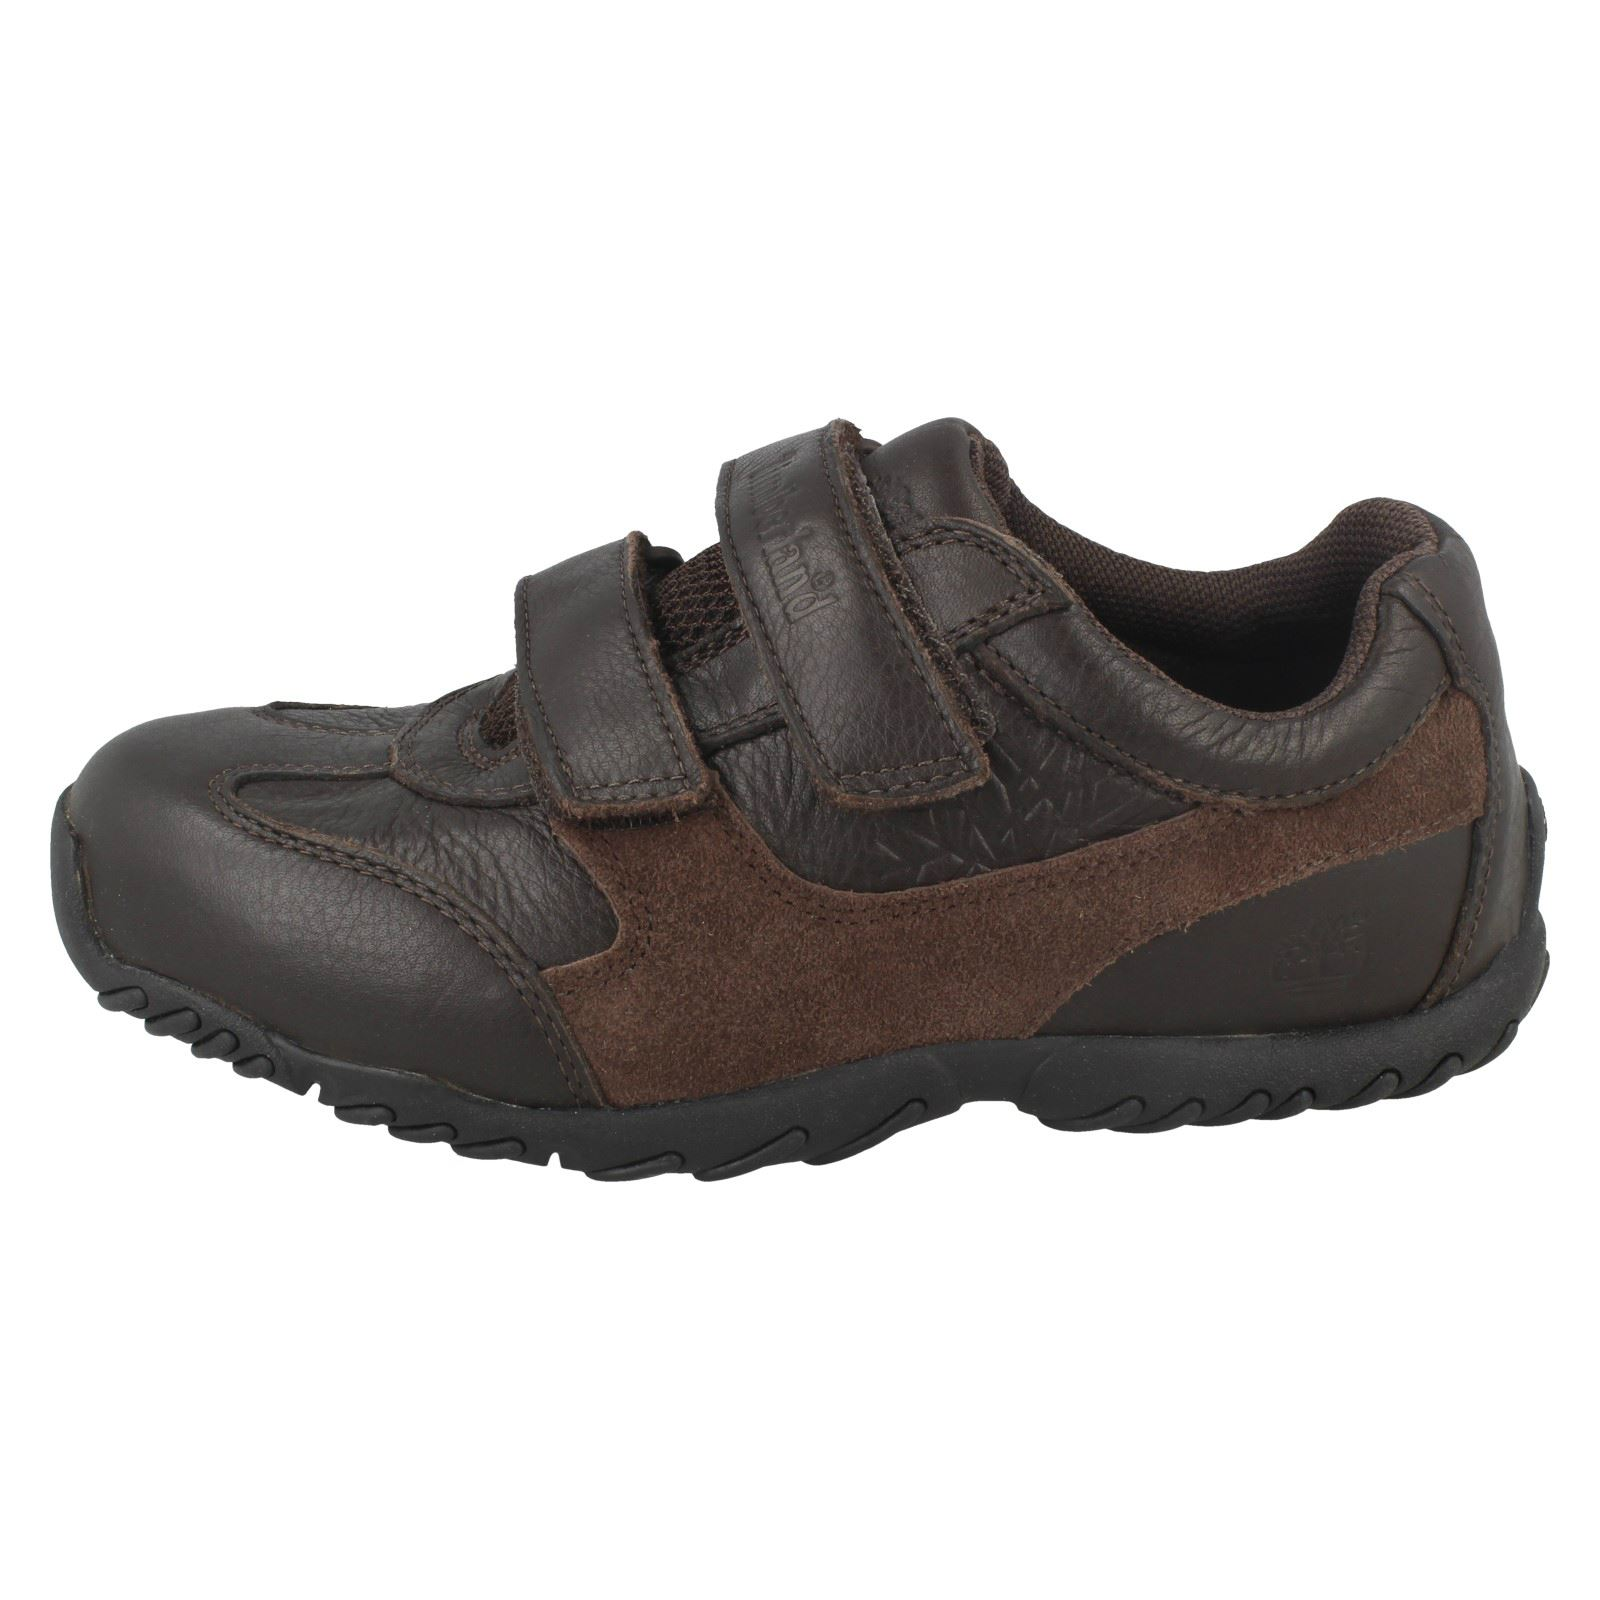 Timberland niños para marrón Zapatillas 87959 escolares inteligentes qx6cZP